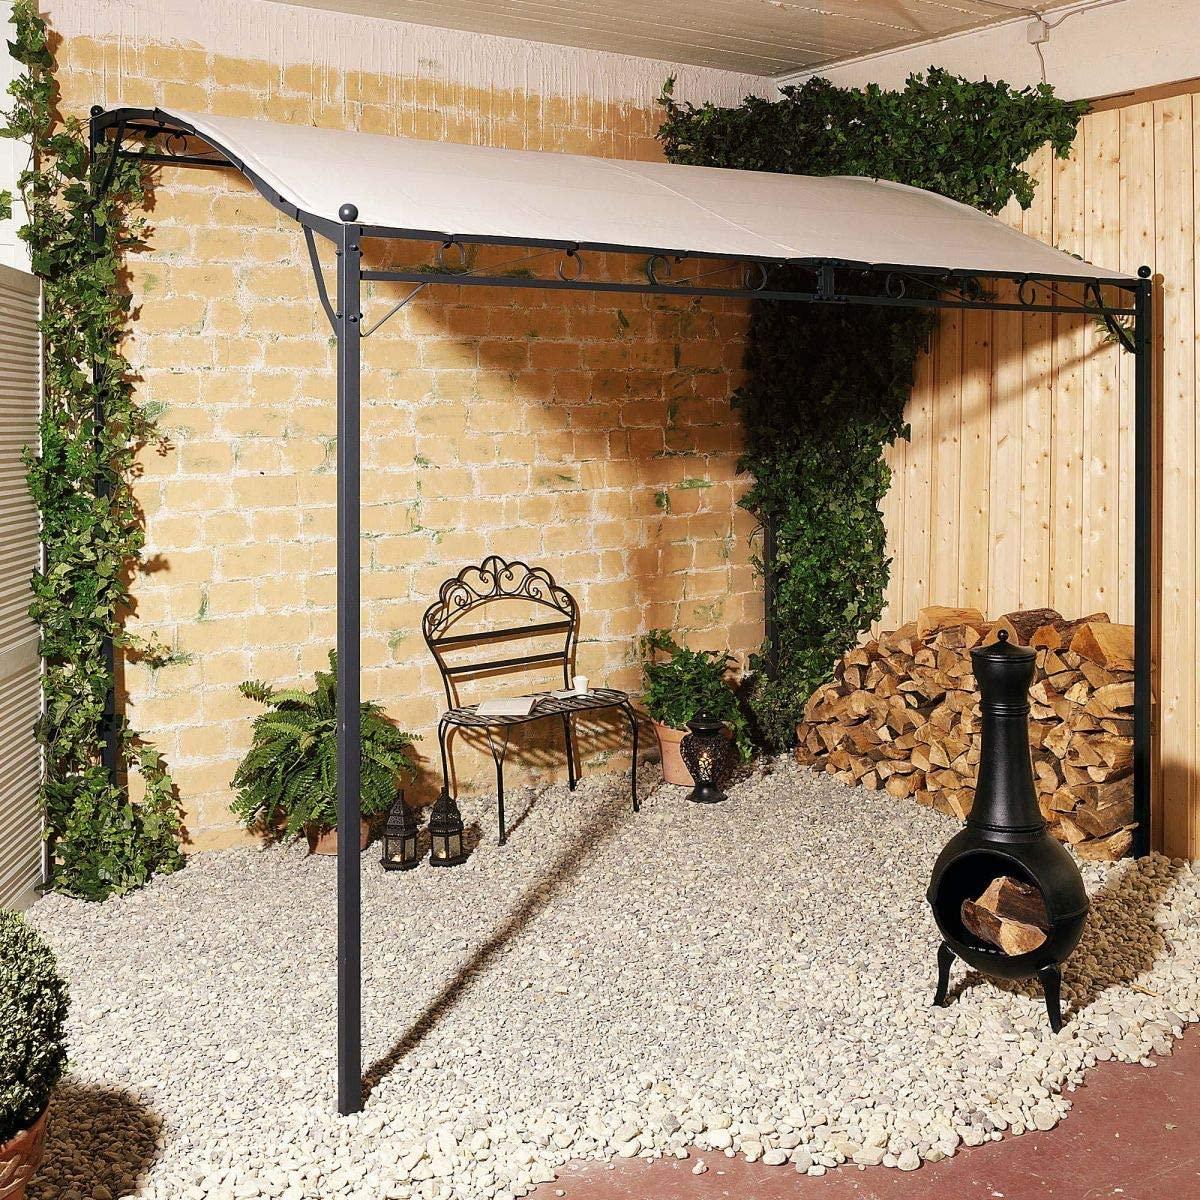 Full Size of Terrassen Pavillon Wasserdicht Winterfest Metall Aluminium Bauhaus Alu Freistehend Garten Wohnzimmer Terrassen Pavillon